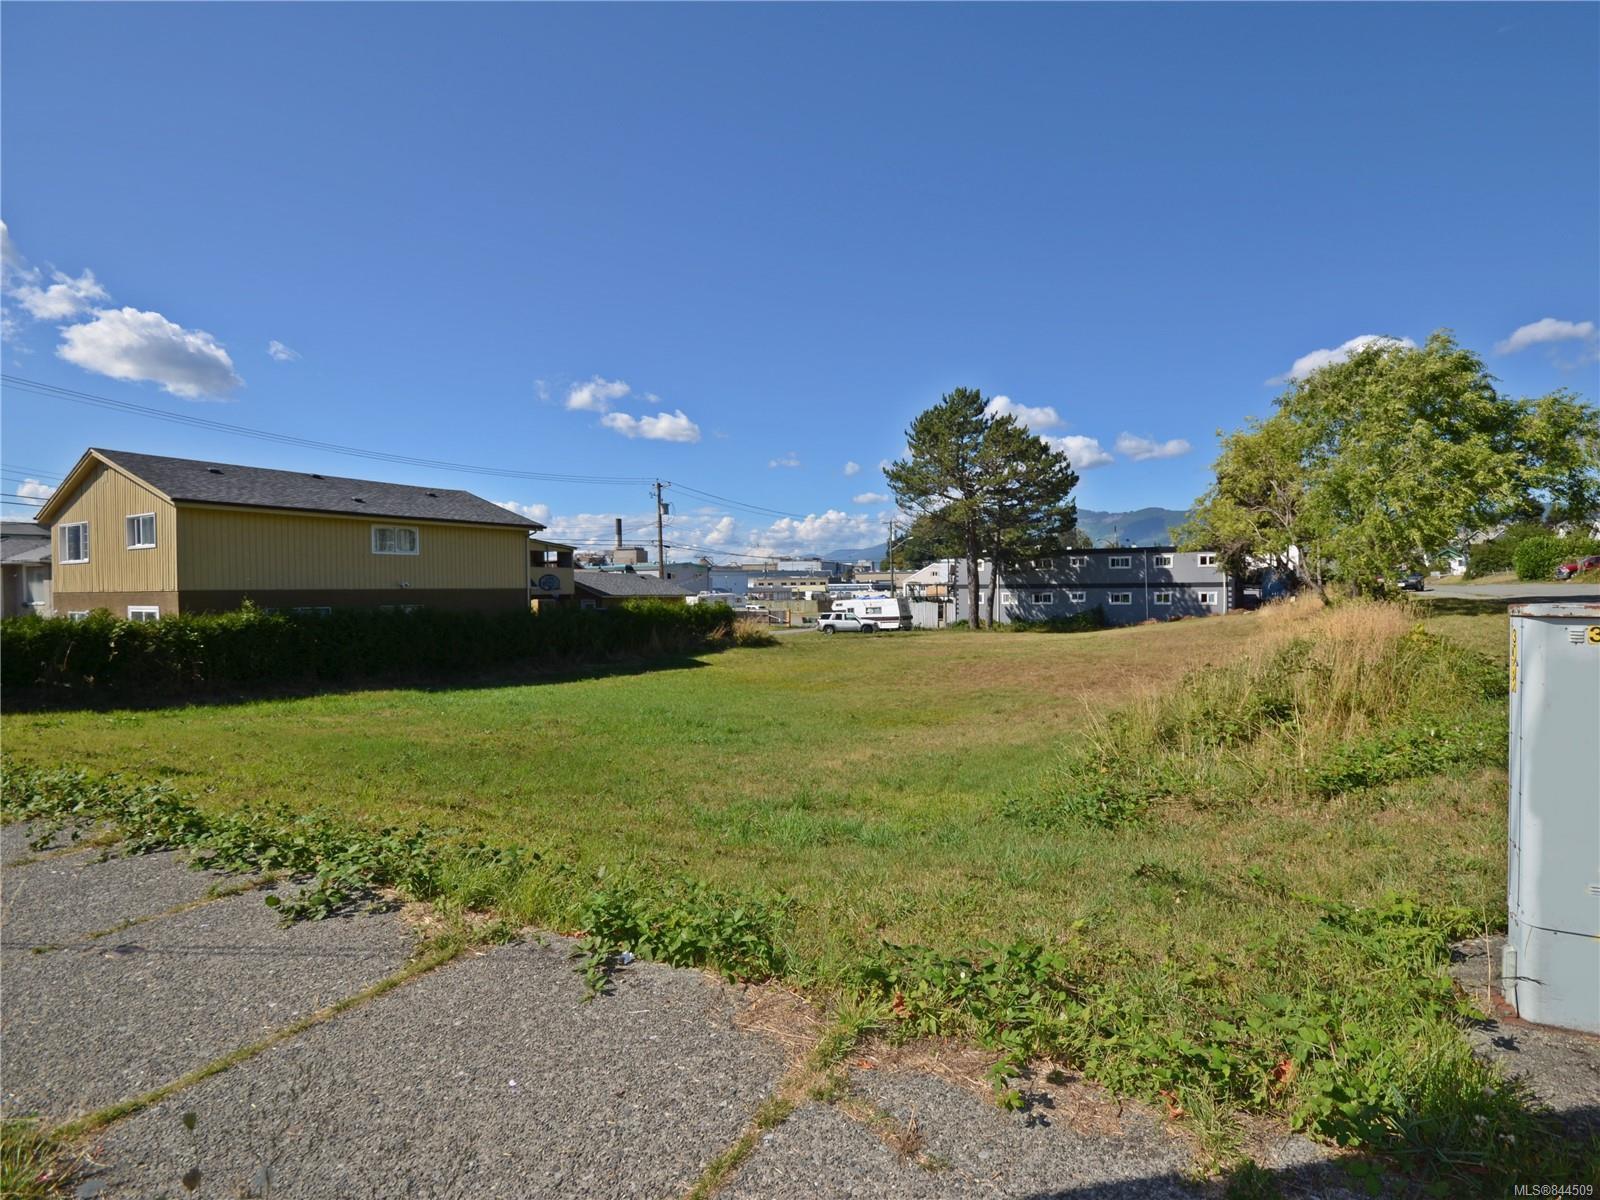 Main Photo: 4835 Burde St in PORT ALBERNI: PA Port Alberni Mixed Use for sale (Port Alberni)  : MLS®# 844509